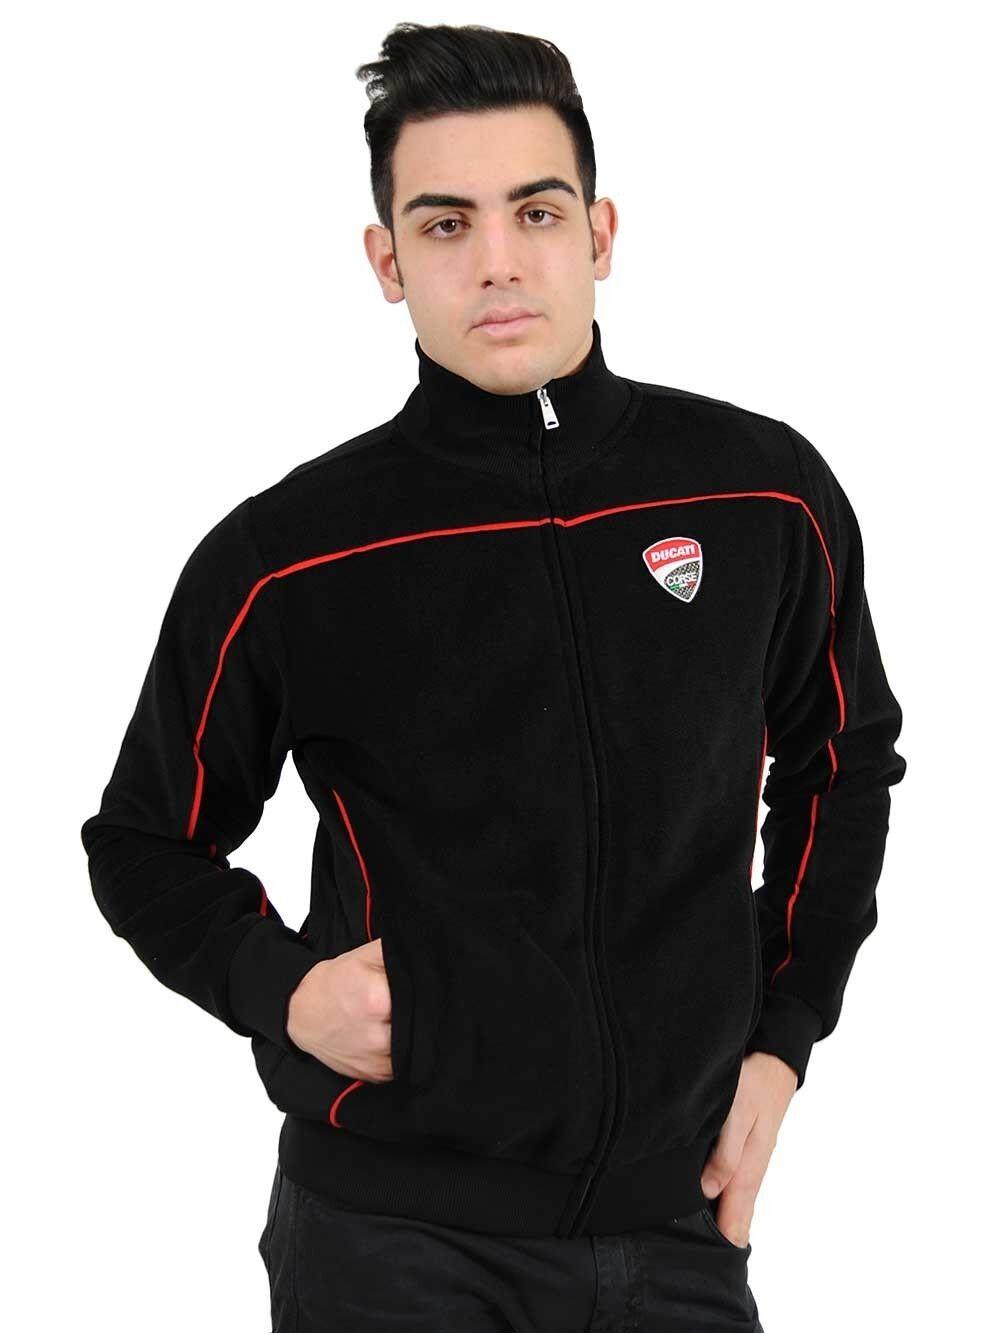 Official Ducati Corse Pile Sweatshirt - 16 66001